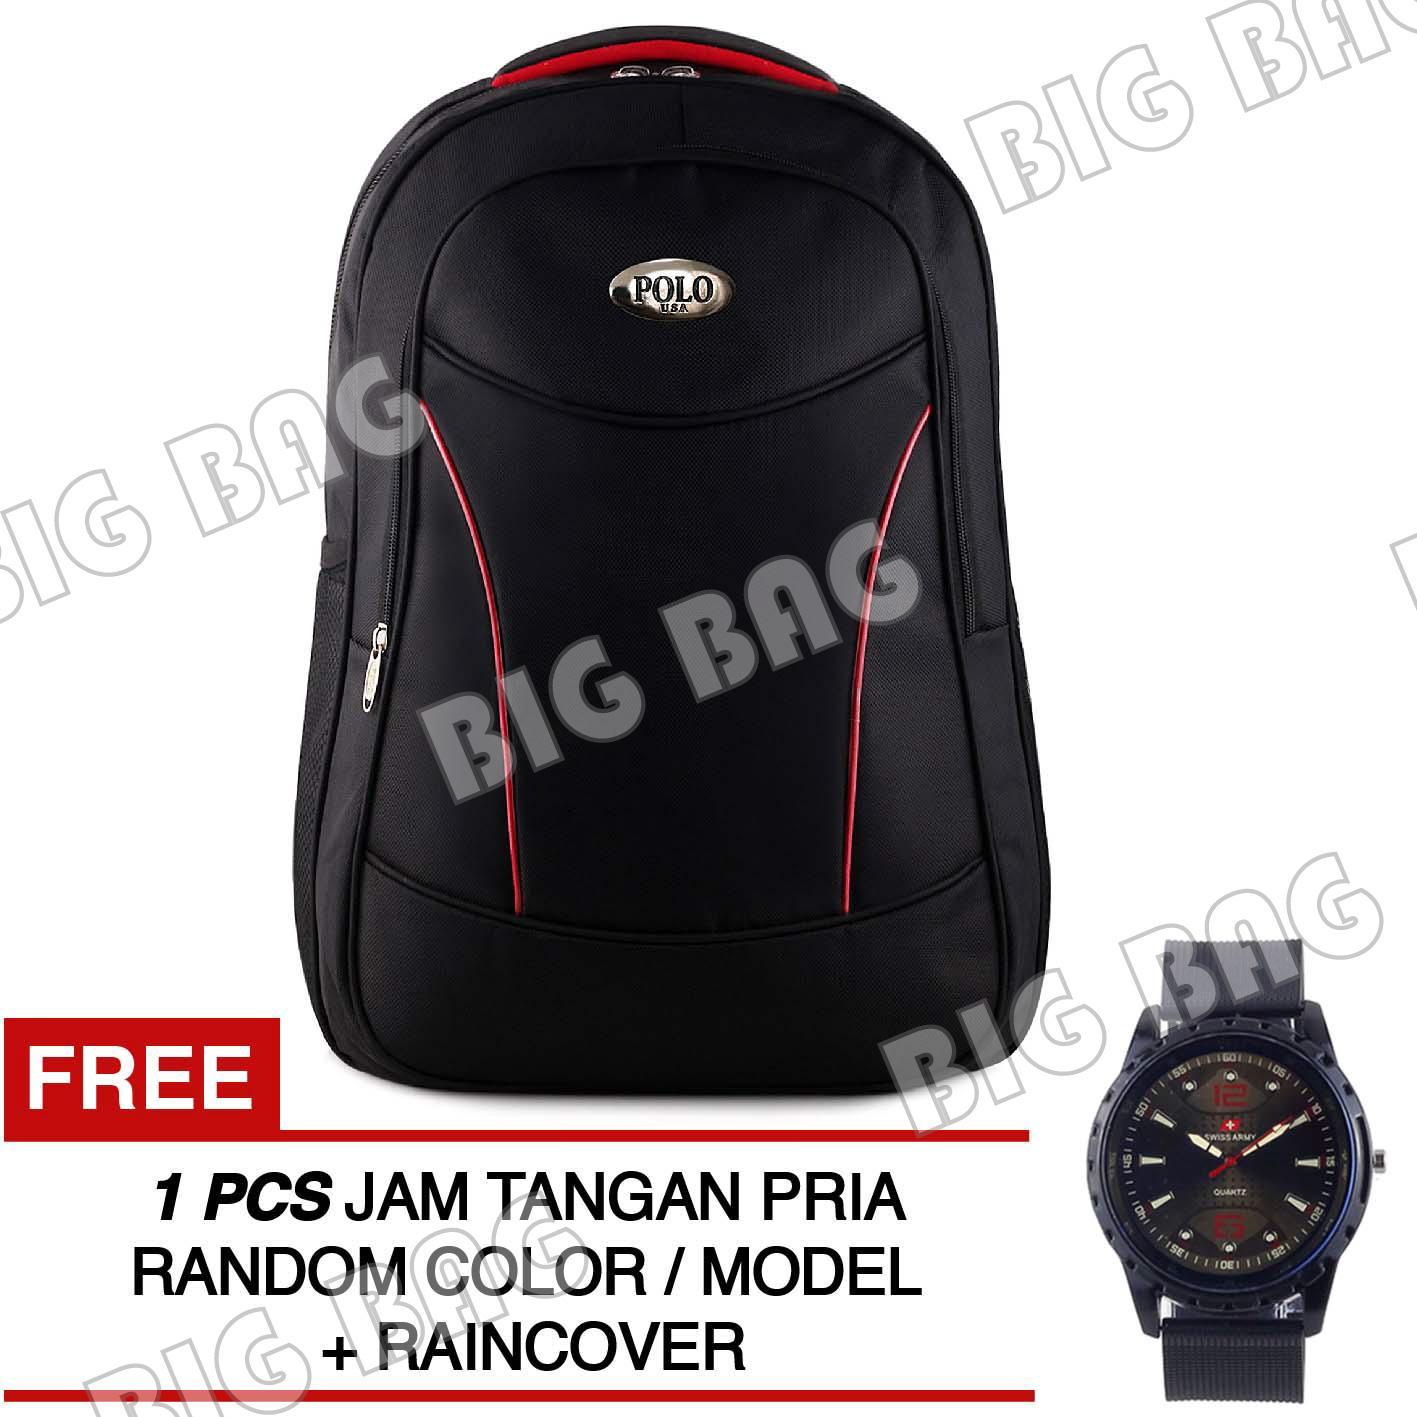 Tas Ransel Polo USA Black Vertex Tas Laptop Backpack + Raincover + FREE Jam Tangan Pria ( RANDOM MODEL ) Tas Pria Tas Kerja Tas Sekolah Tas Fashion Pria